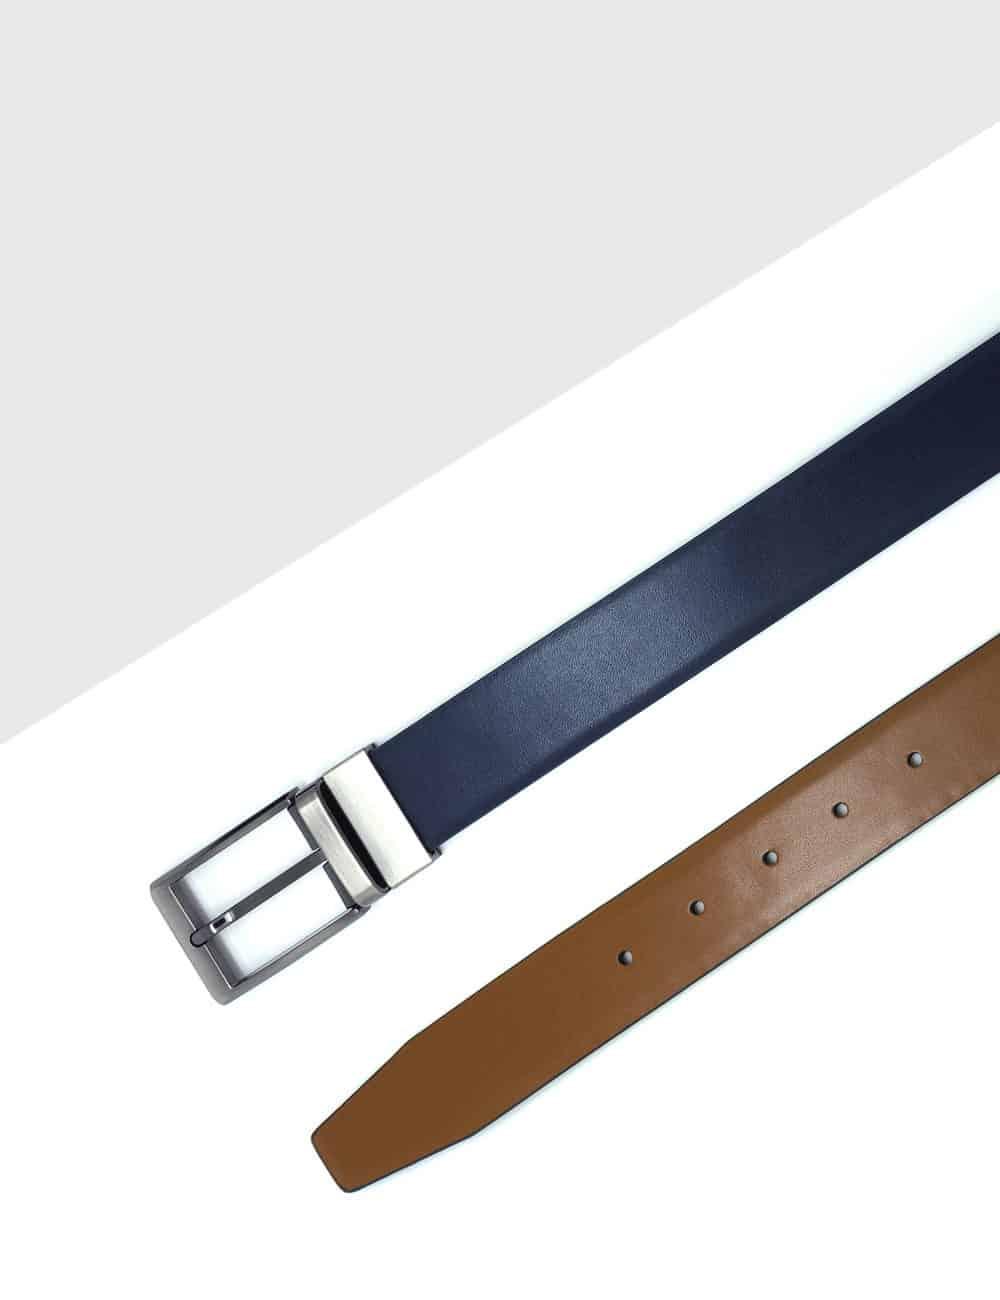 Navy / Tan Reversible Leather Belt LBR15.8